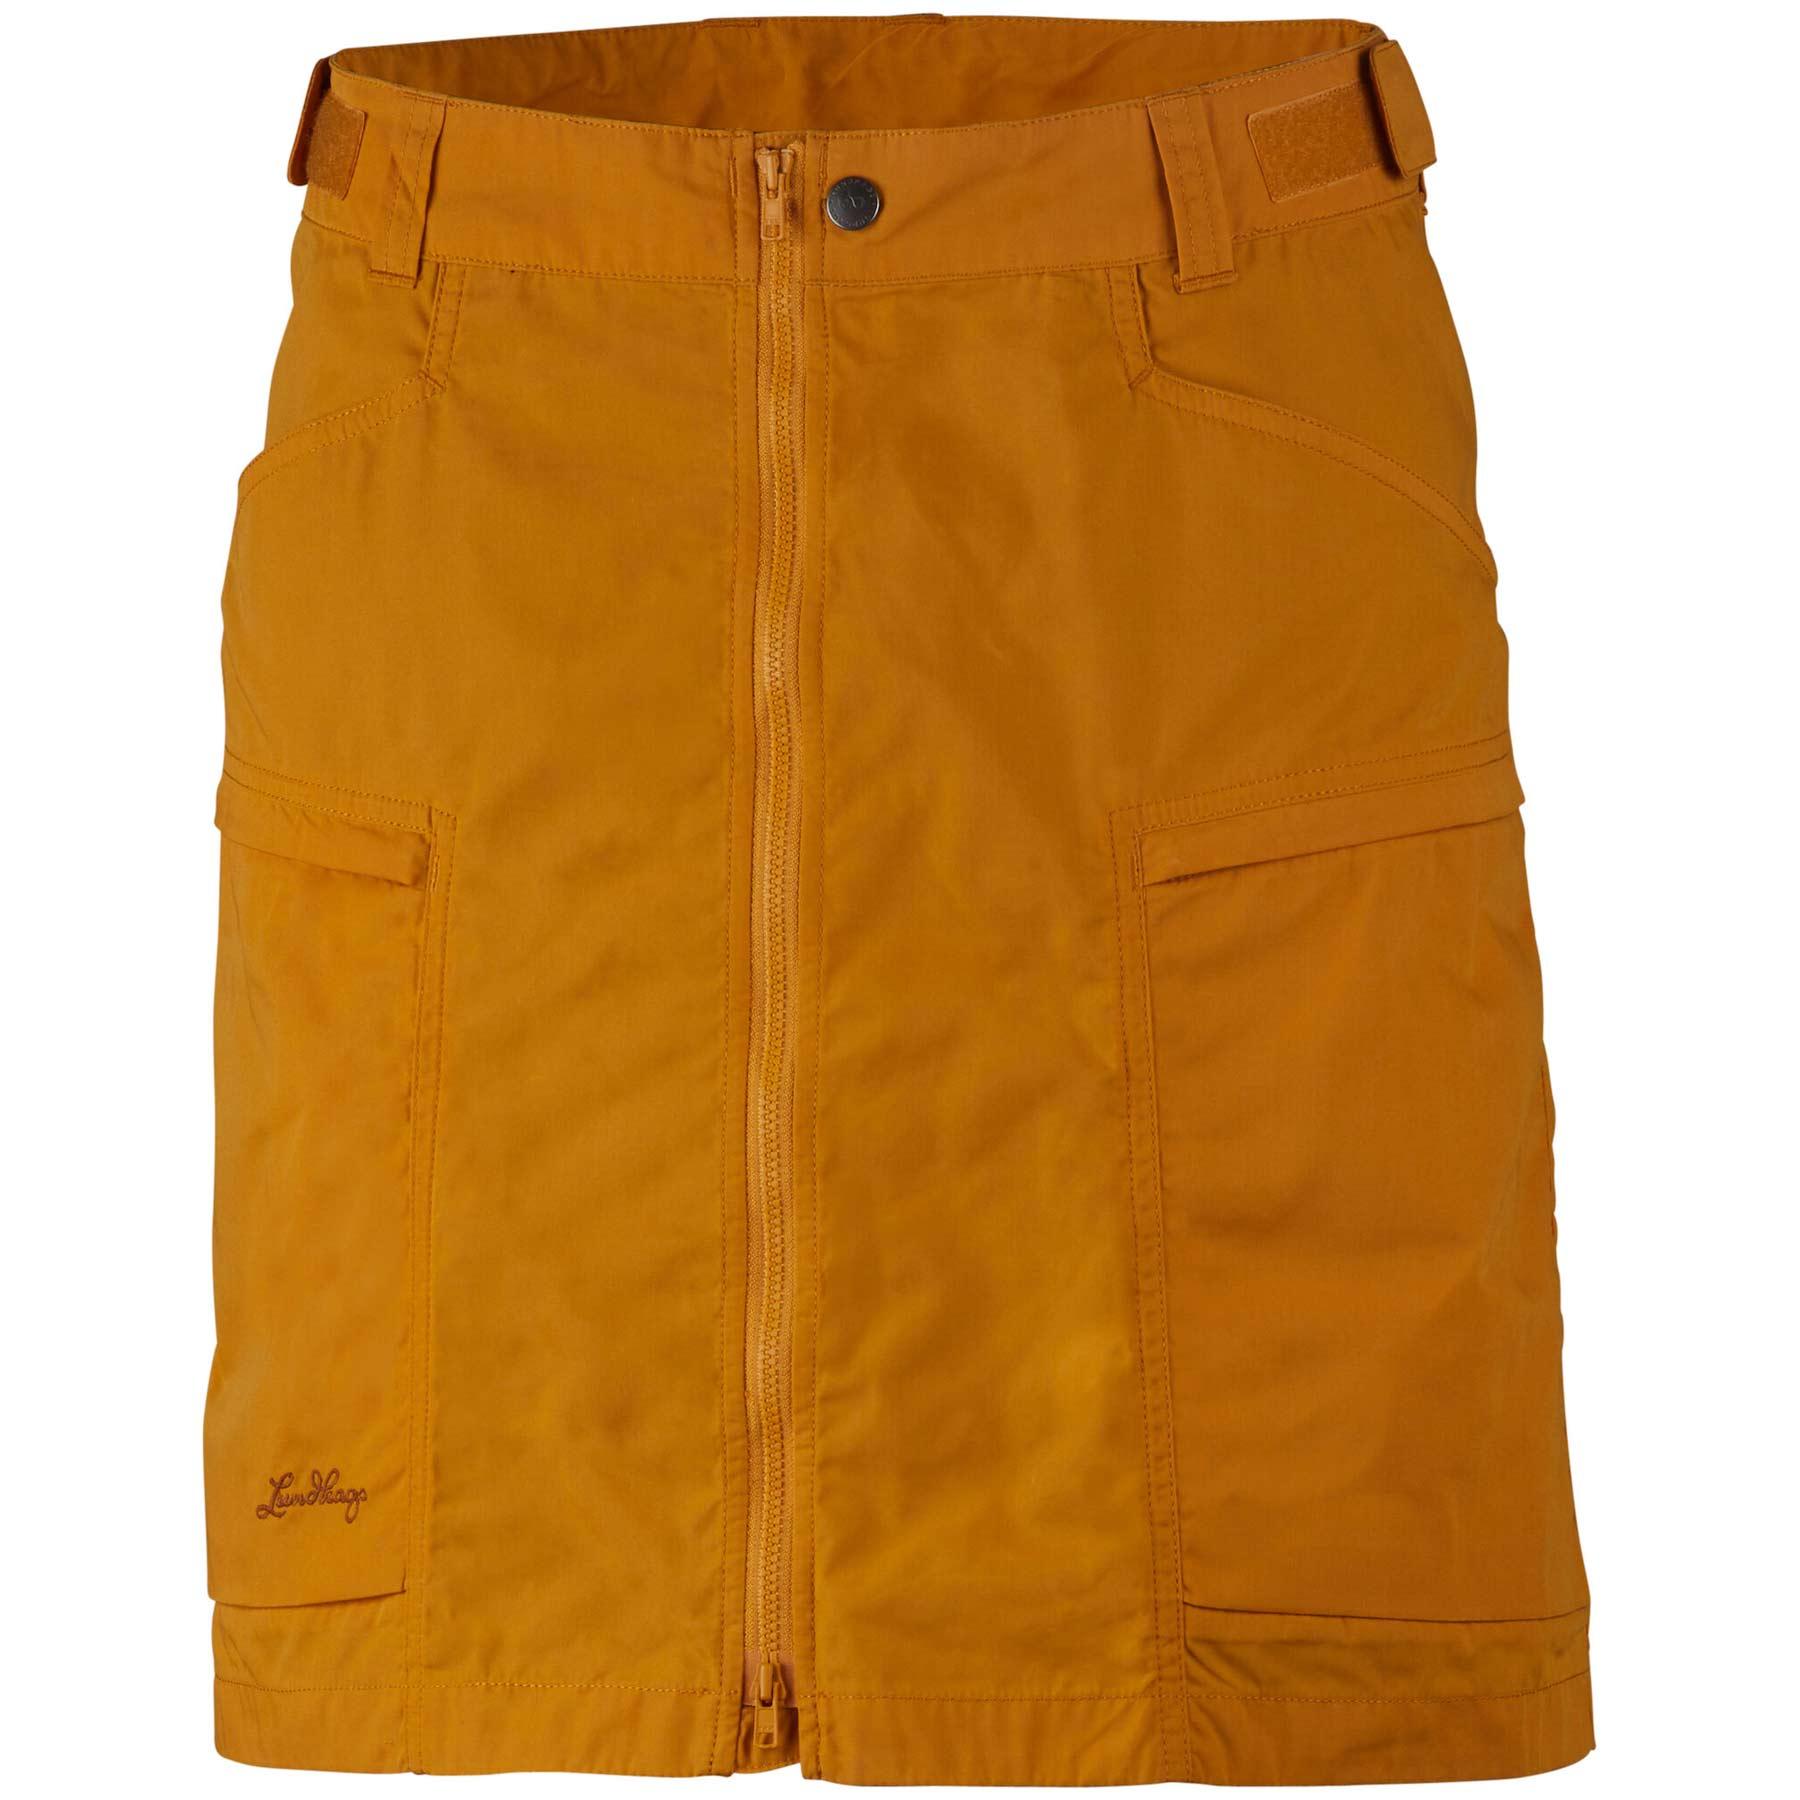 Lundhags Tiven II Women's Skirt - Gold 206